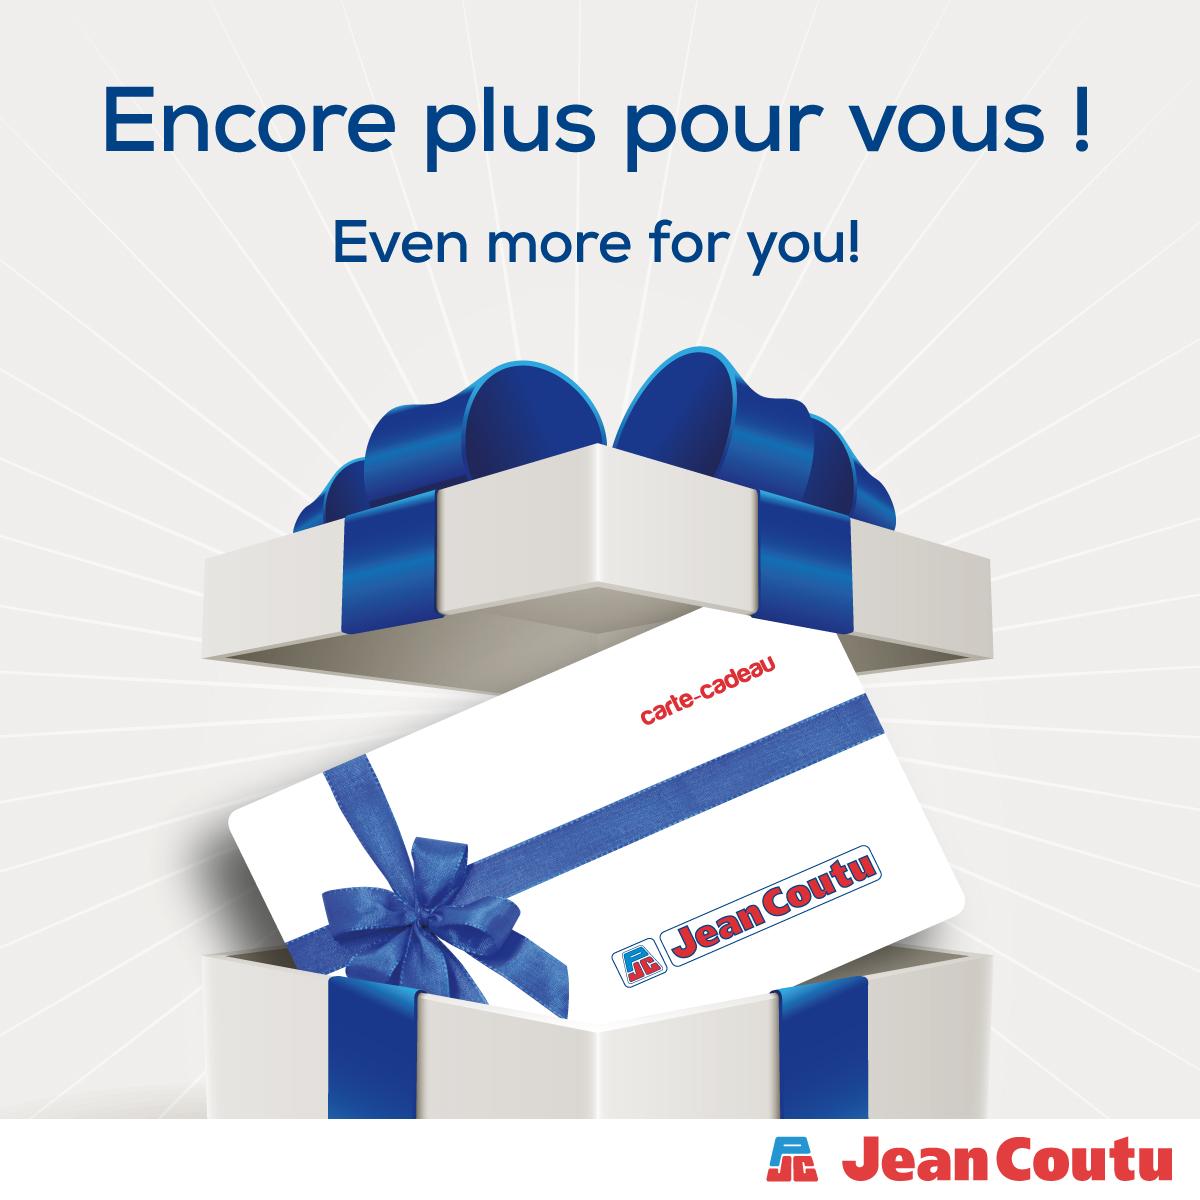 63c04154a0b1a7 Promotions   Jean Coutu